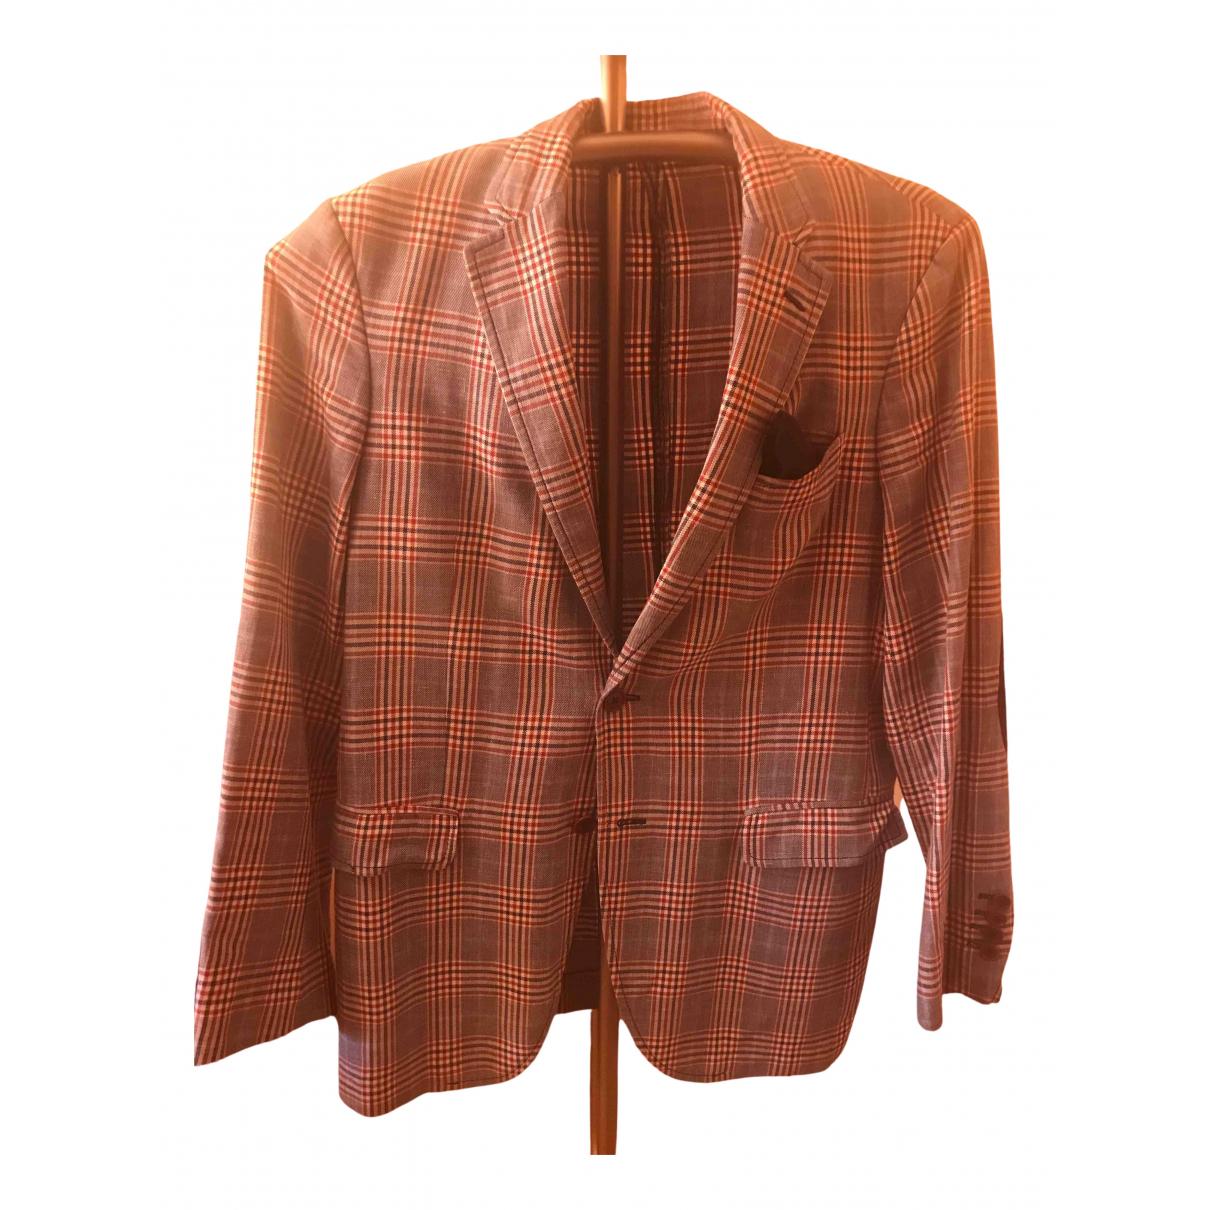 Carolina Herrera \N Multicolour Cotton jacket  for Men L International